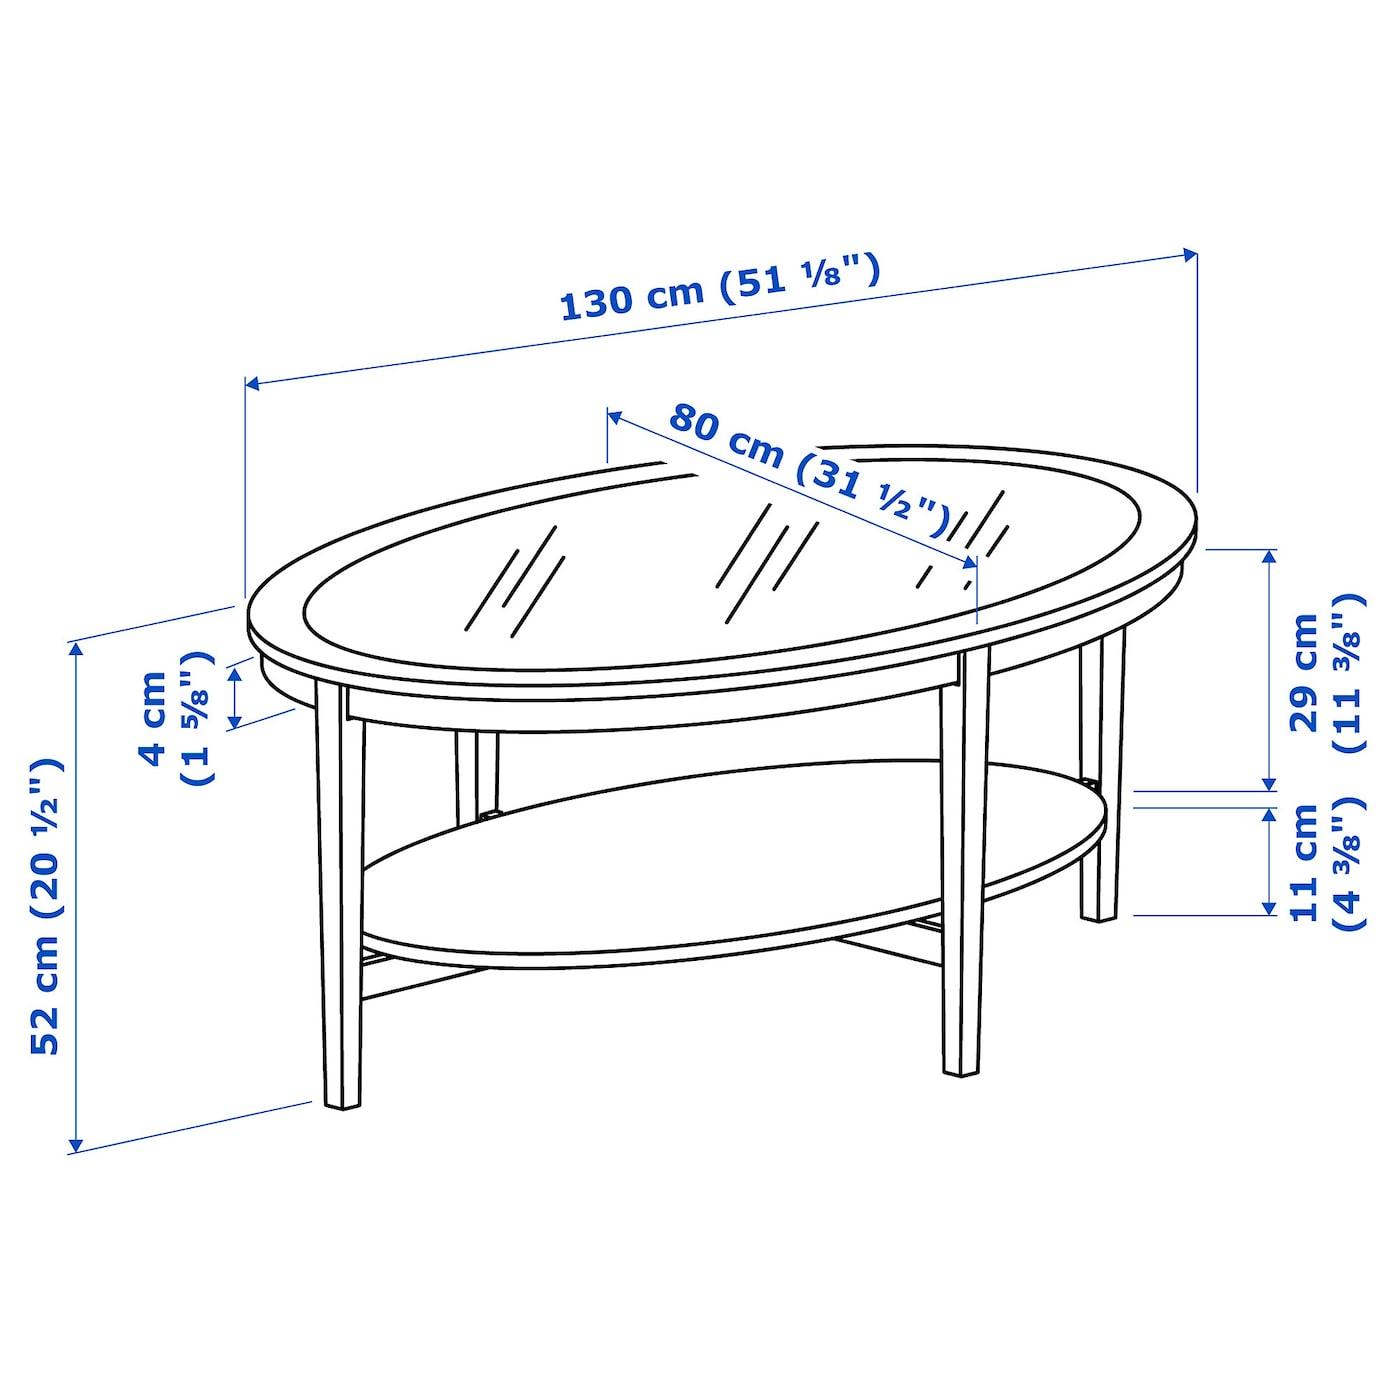 MALMSTA Soffbord, svartbrun, 130x80 cm IKEA